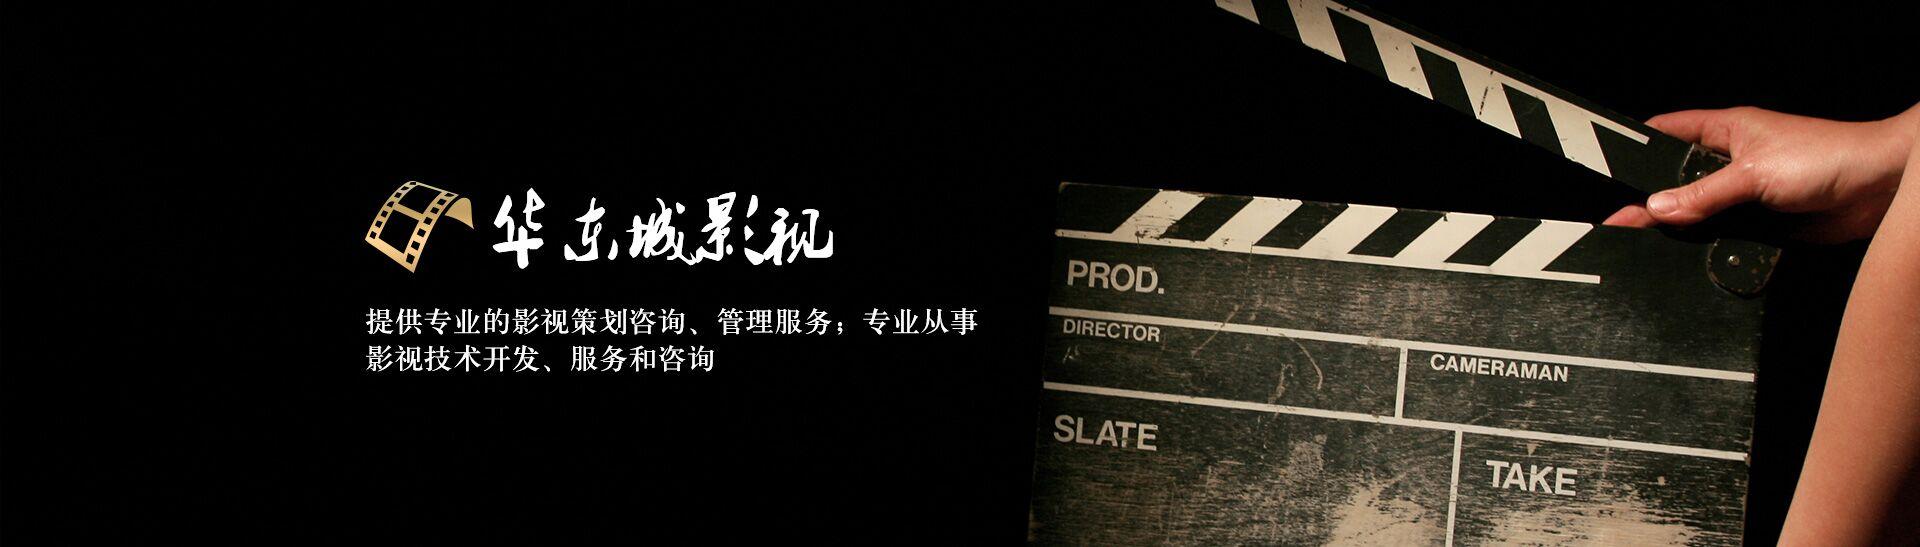 Hd Film Com